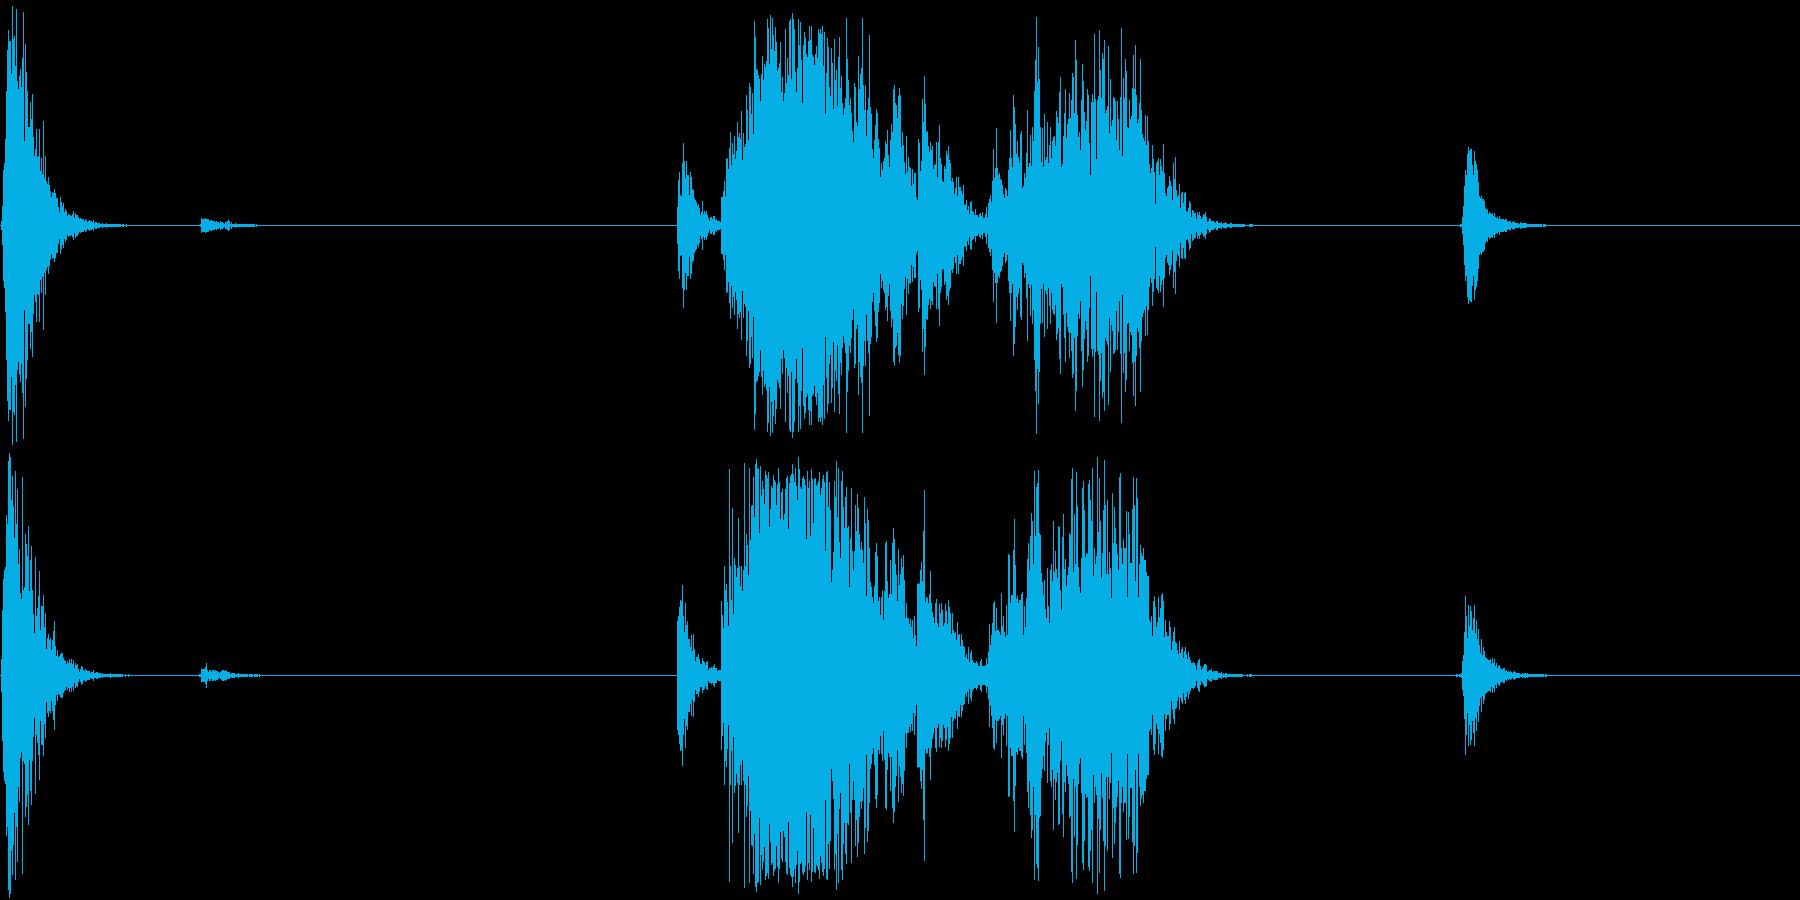 Unseal パッケージを開封する音の再生済みの波形